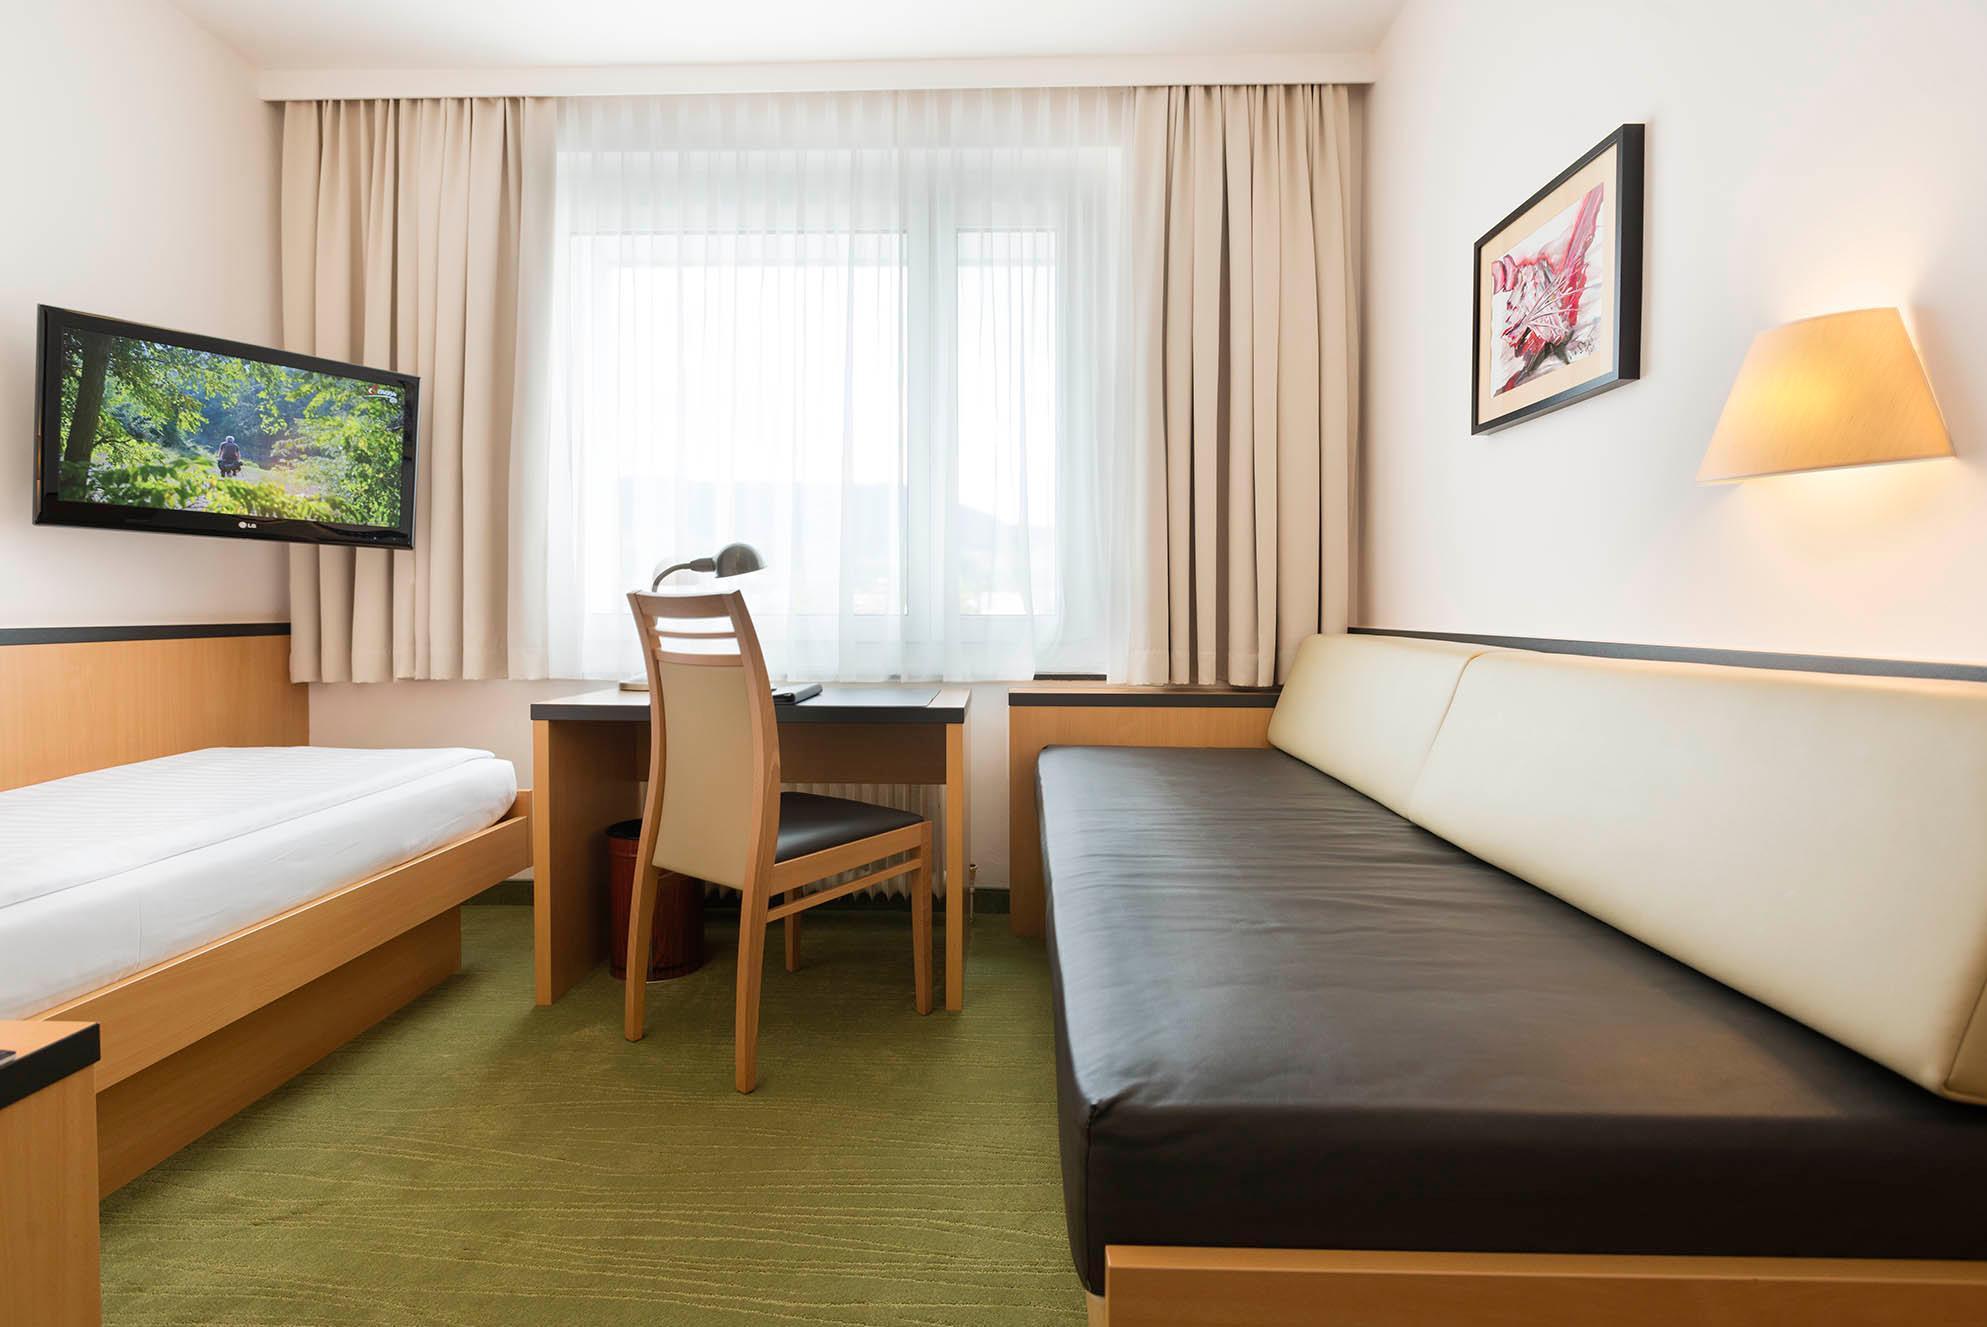 Hotel City, Villach